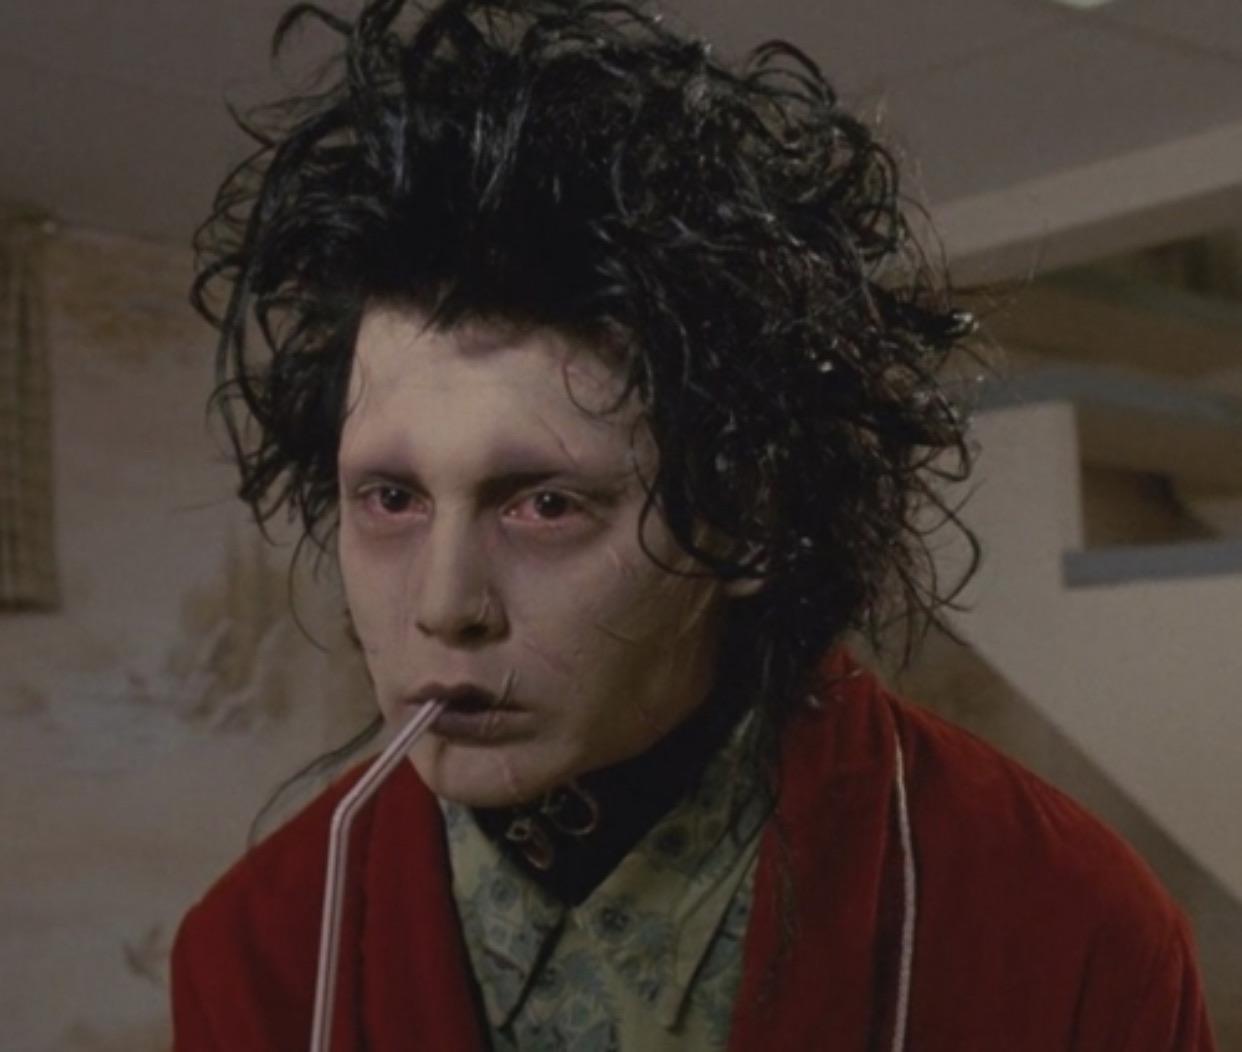 johnny depp, edward scissorhands, and movie image